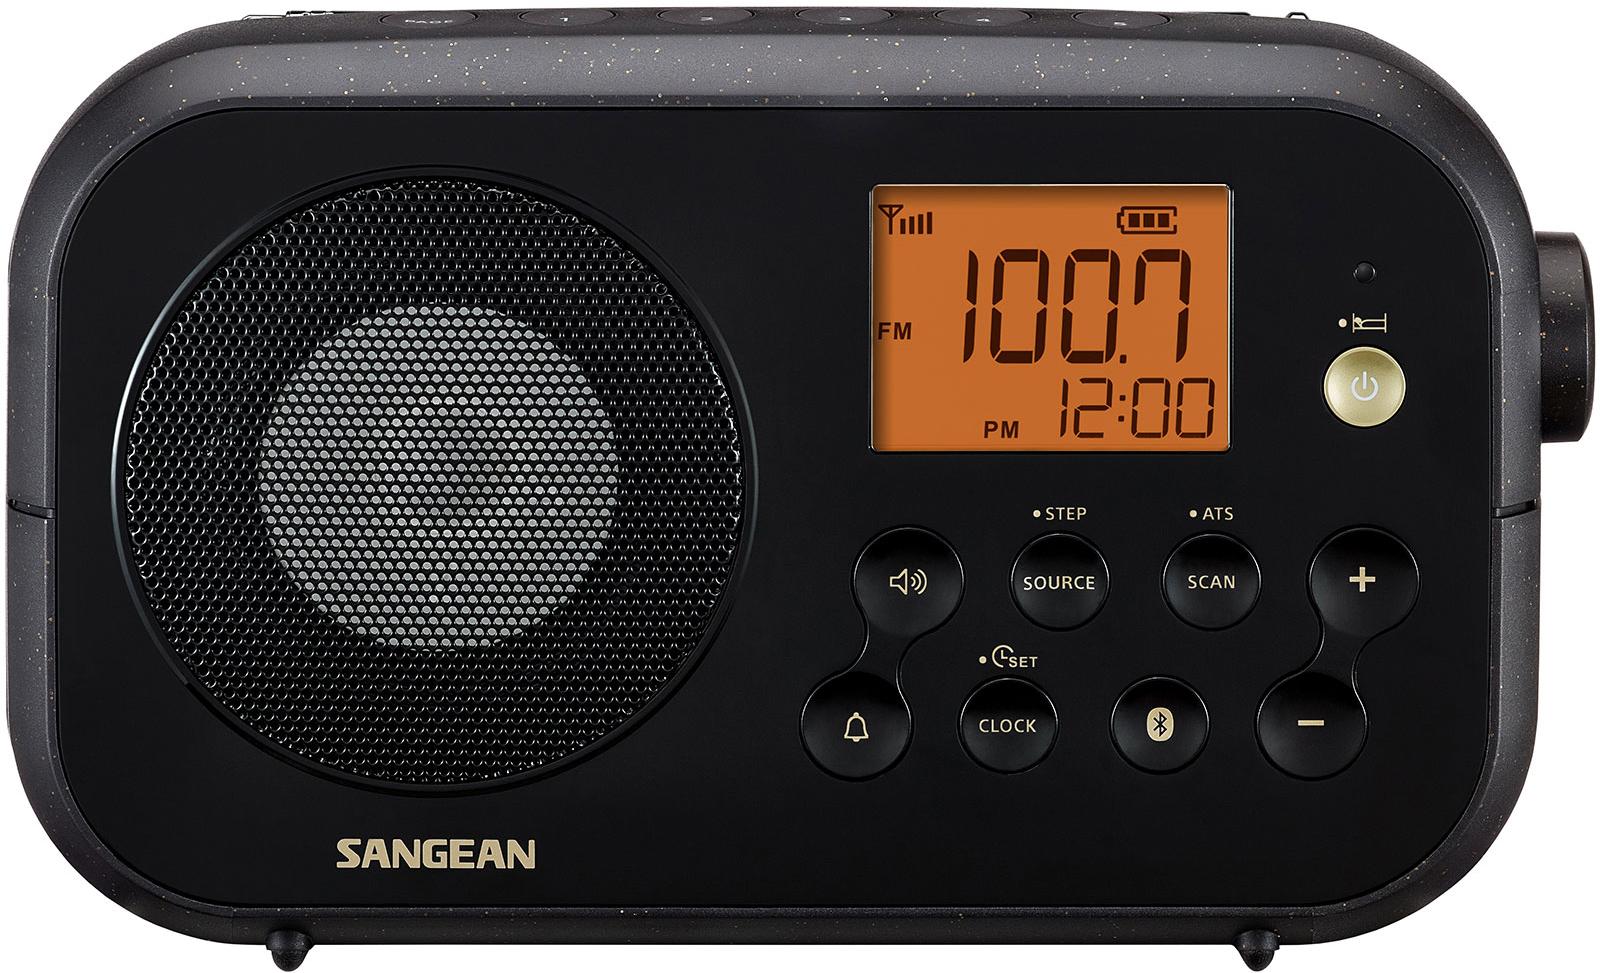 Sangean Bluetooth FM snabbval